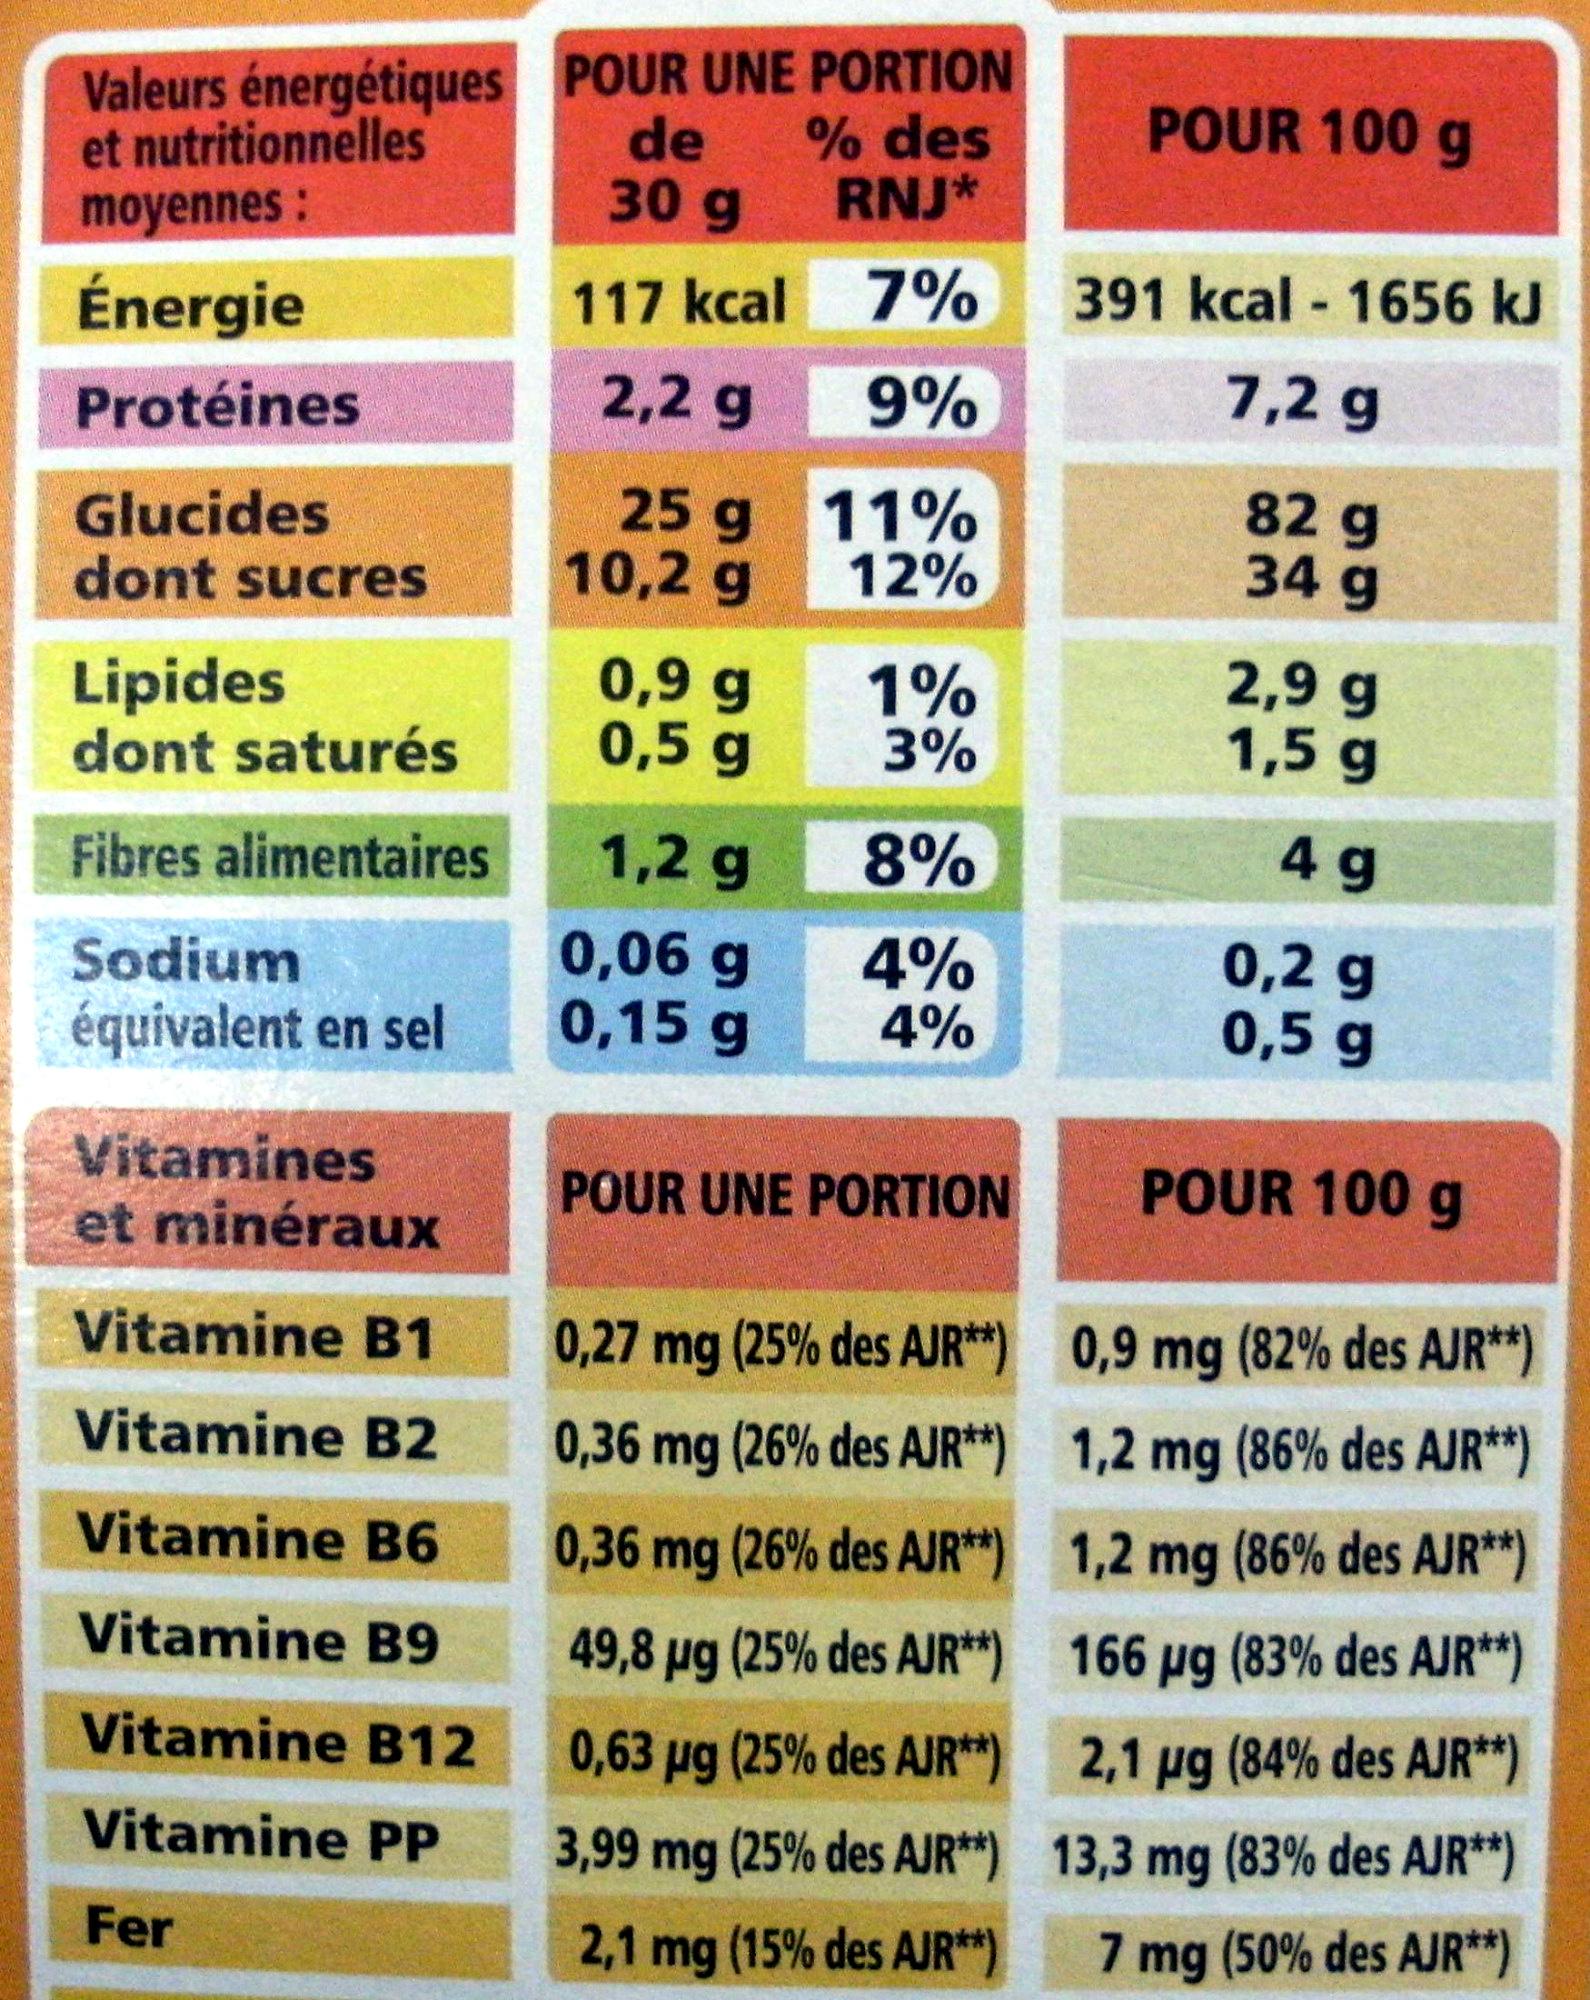 Pyramides au chocolat - Nutrition facts - fr